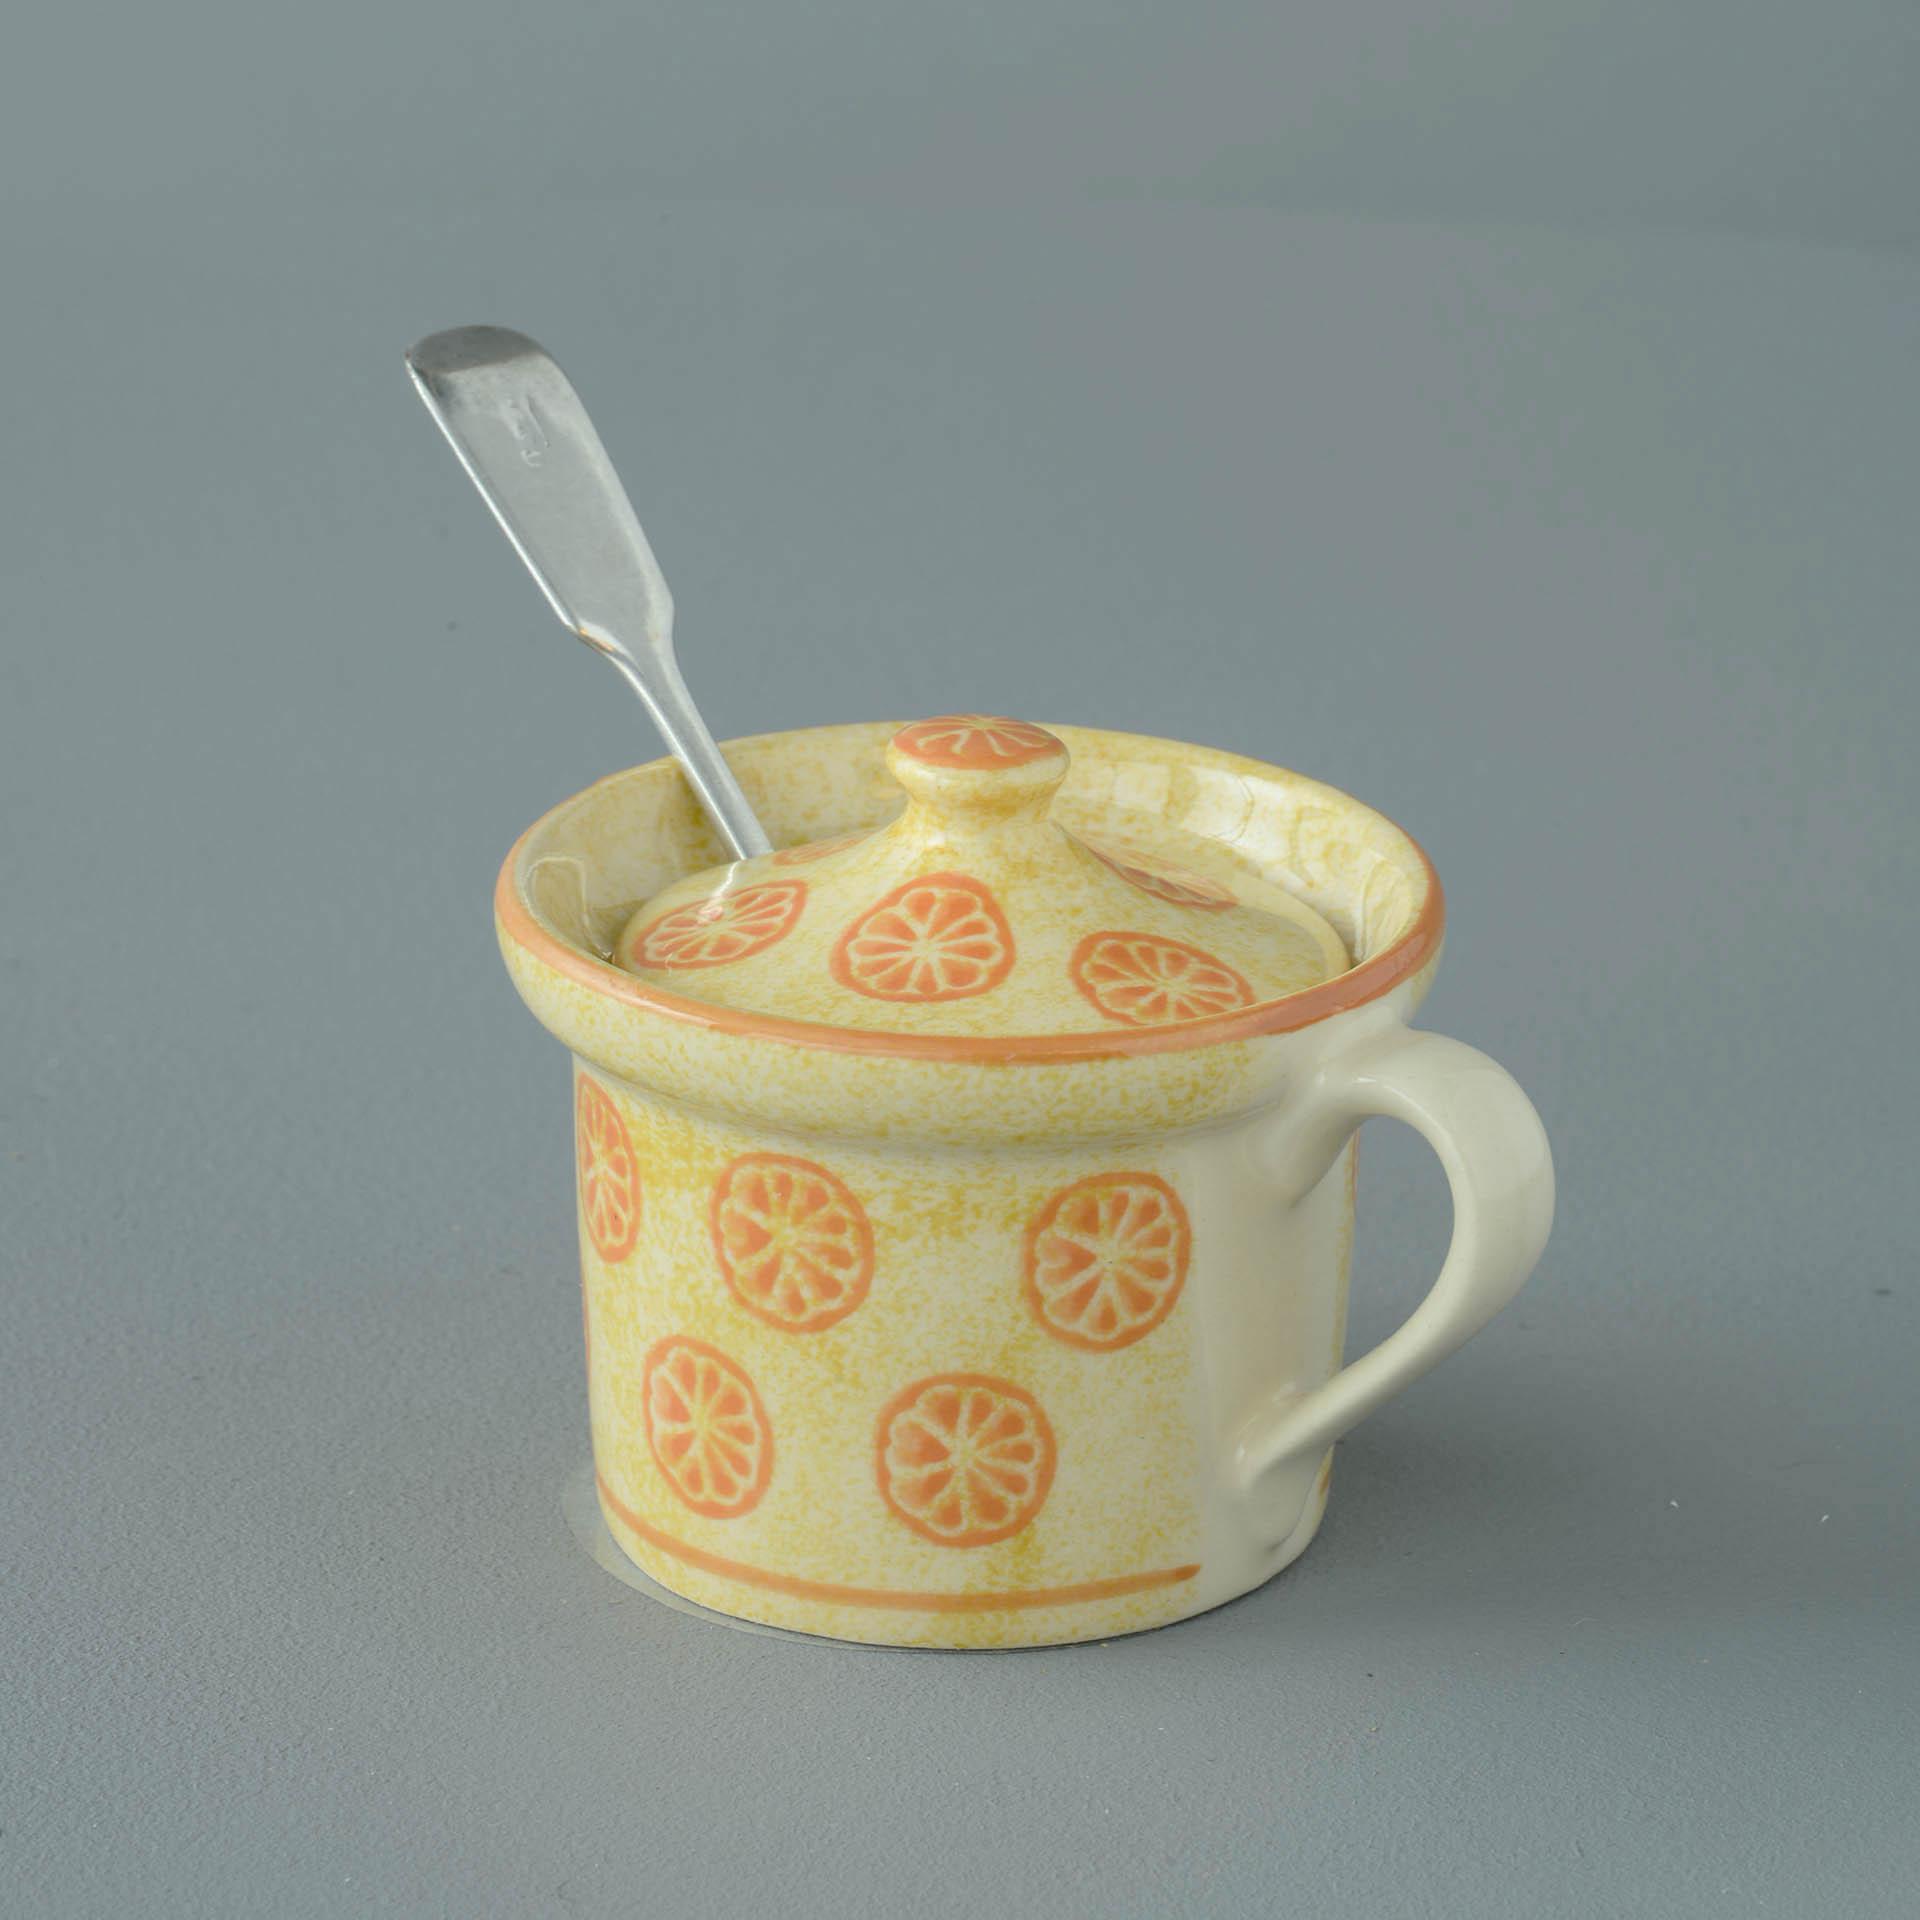 Marmalade Mustard Pot 7.8(w) x 5.4(h) cm